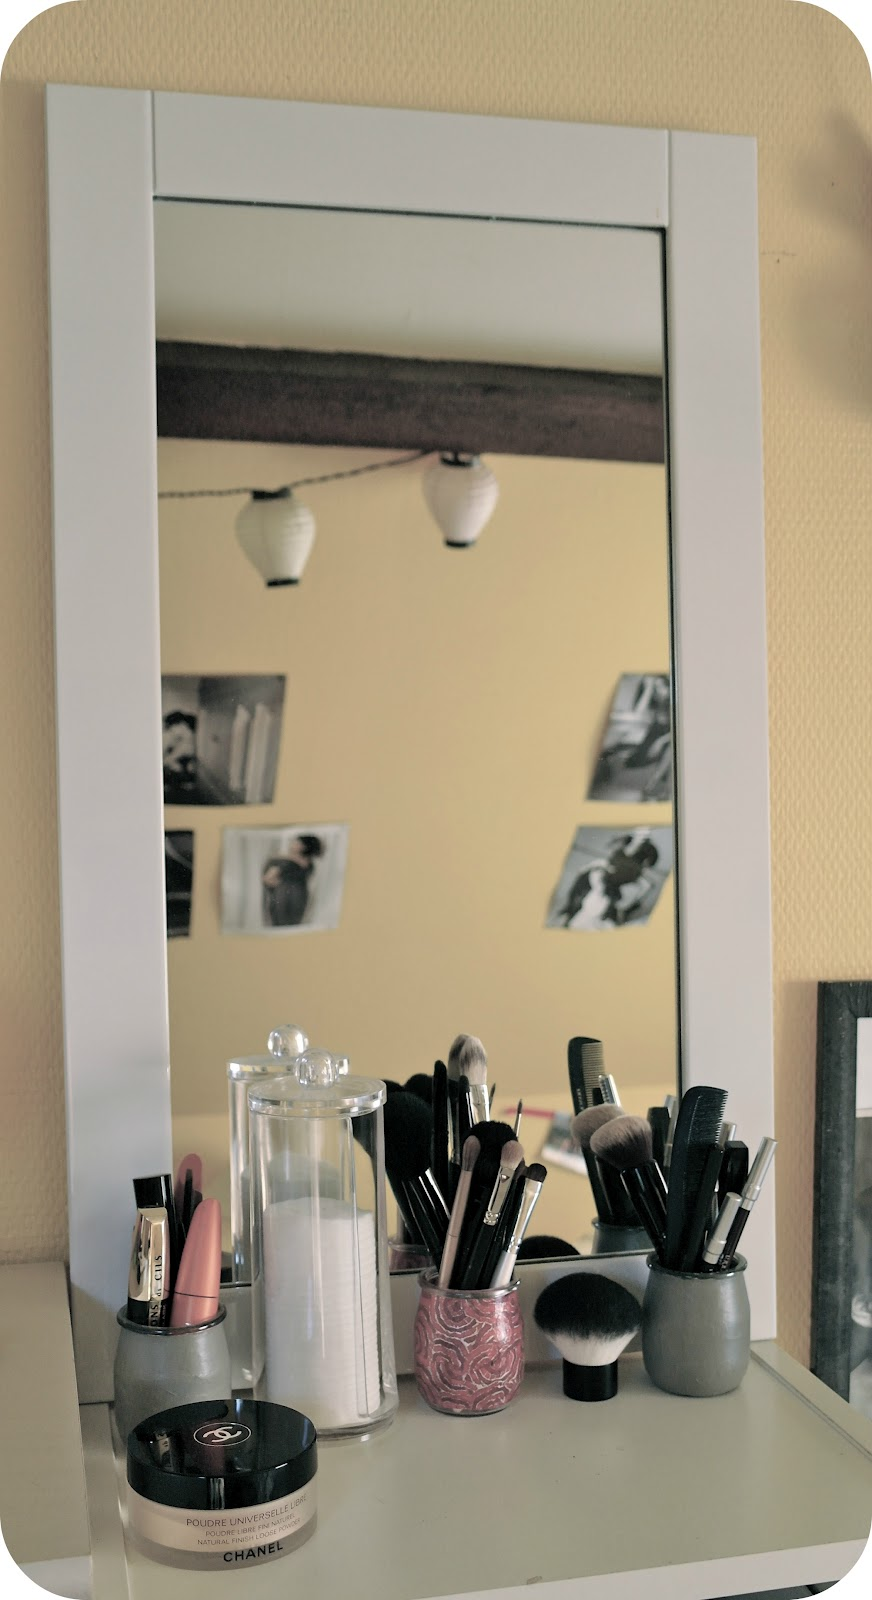 Br Ves De Maquillage Mes Astuces De Rangements Make Up